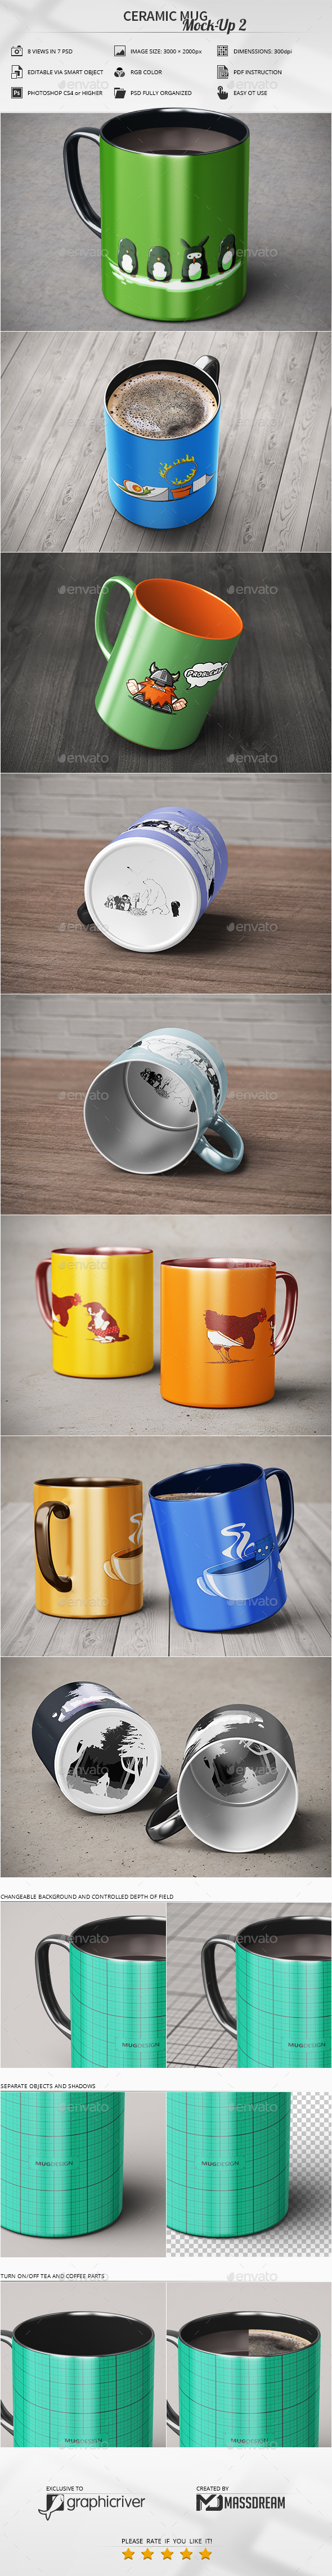 Ceramic Mug Mock-Up 2 - Food and Drink Packaging